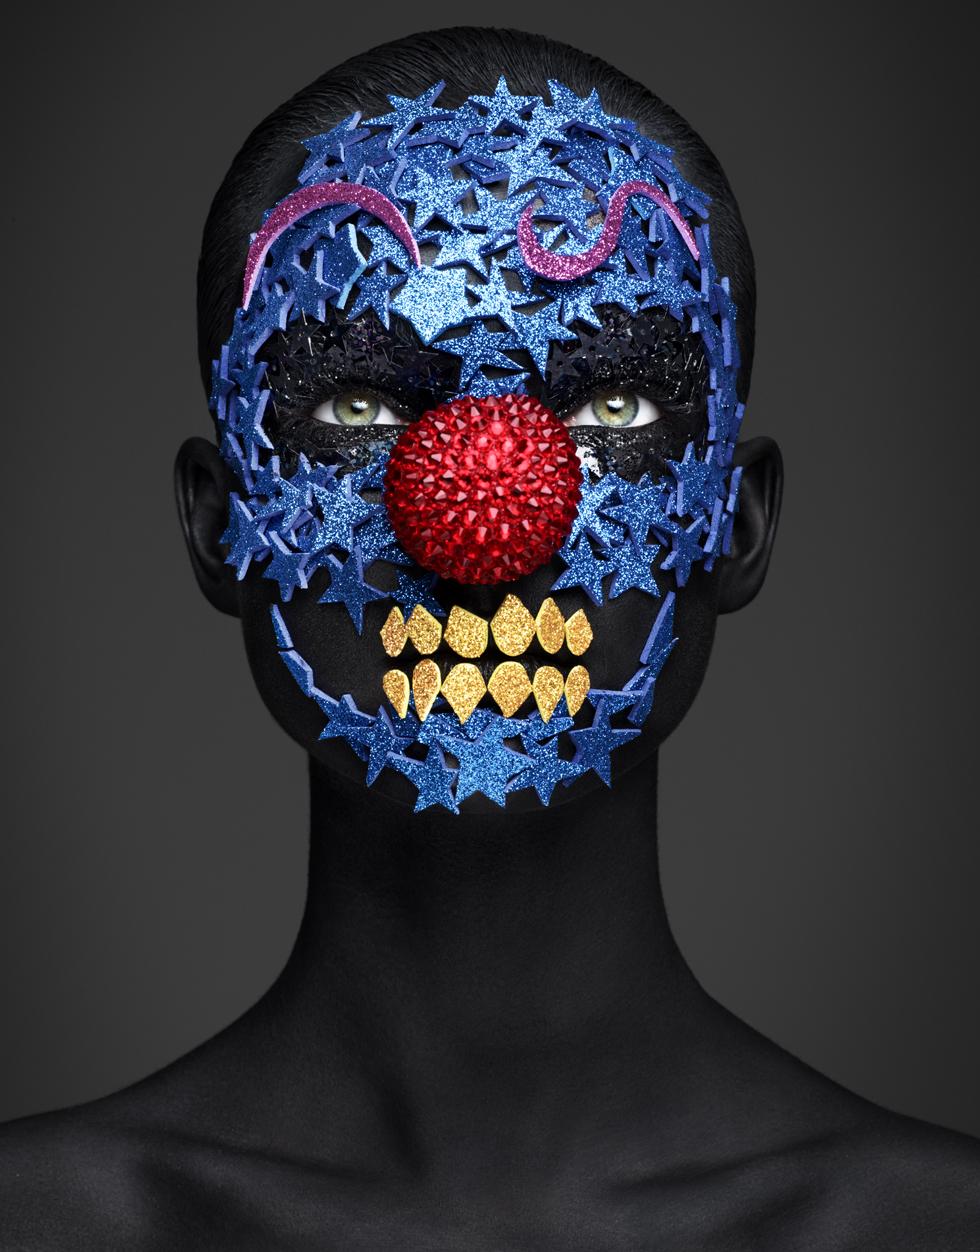 andrew-gallimore-diadelasmuertes-masks-06